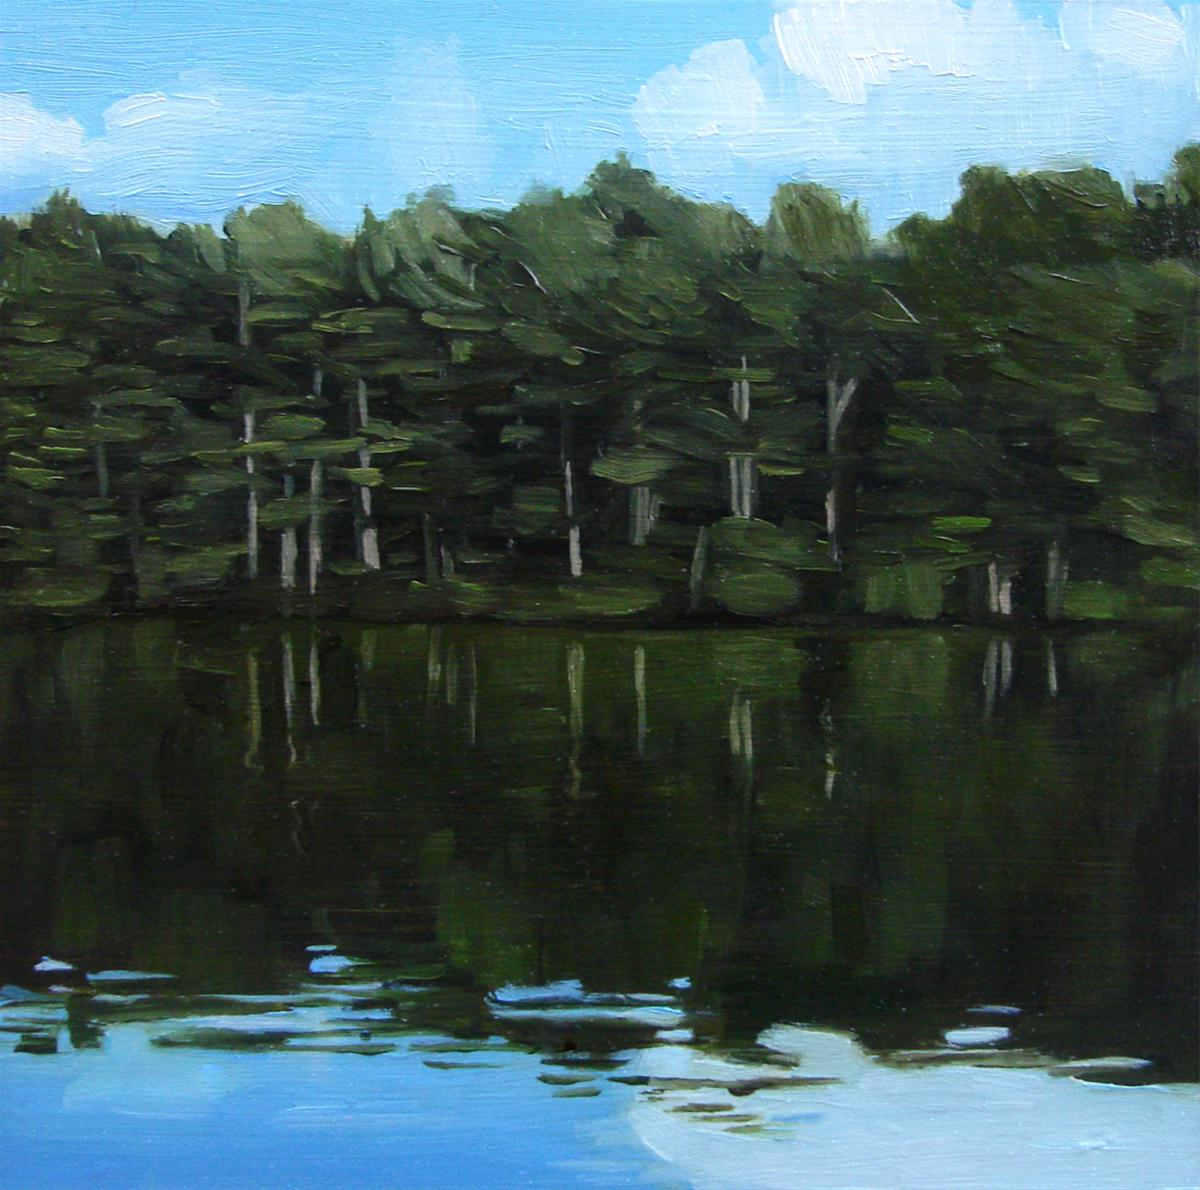 """Lake Monomanoc Treeline, NH (NO.39)"" original fine art by Michael William"